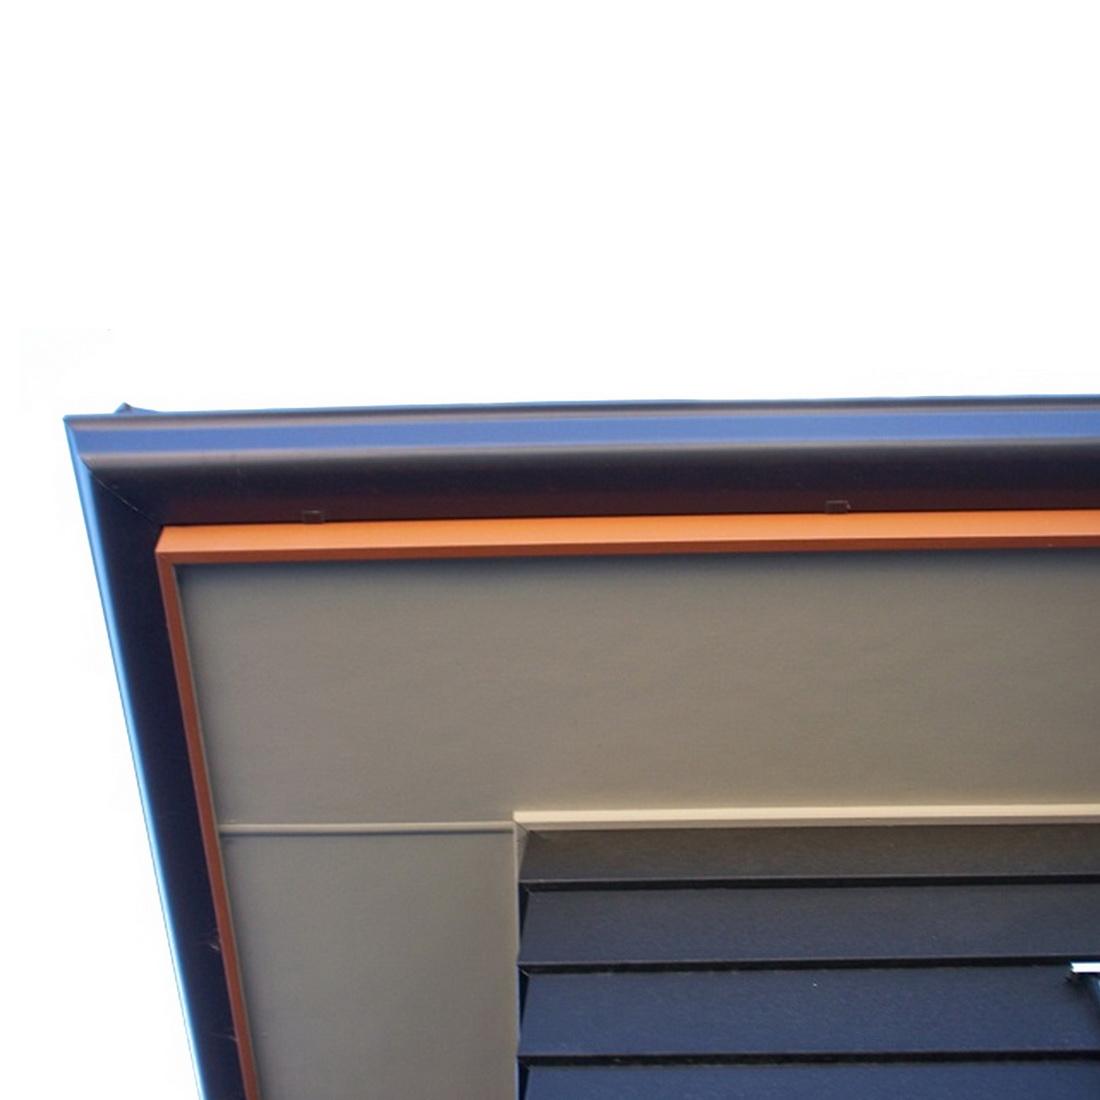 HardieFlex Eaves Lining 2400 x 900 x 4.5mm